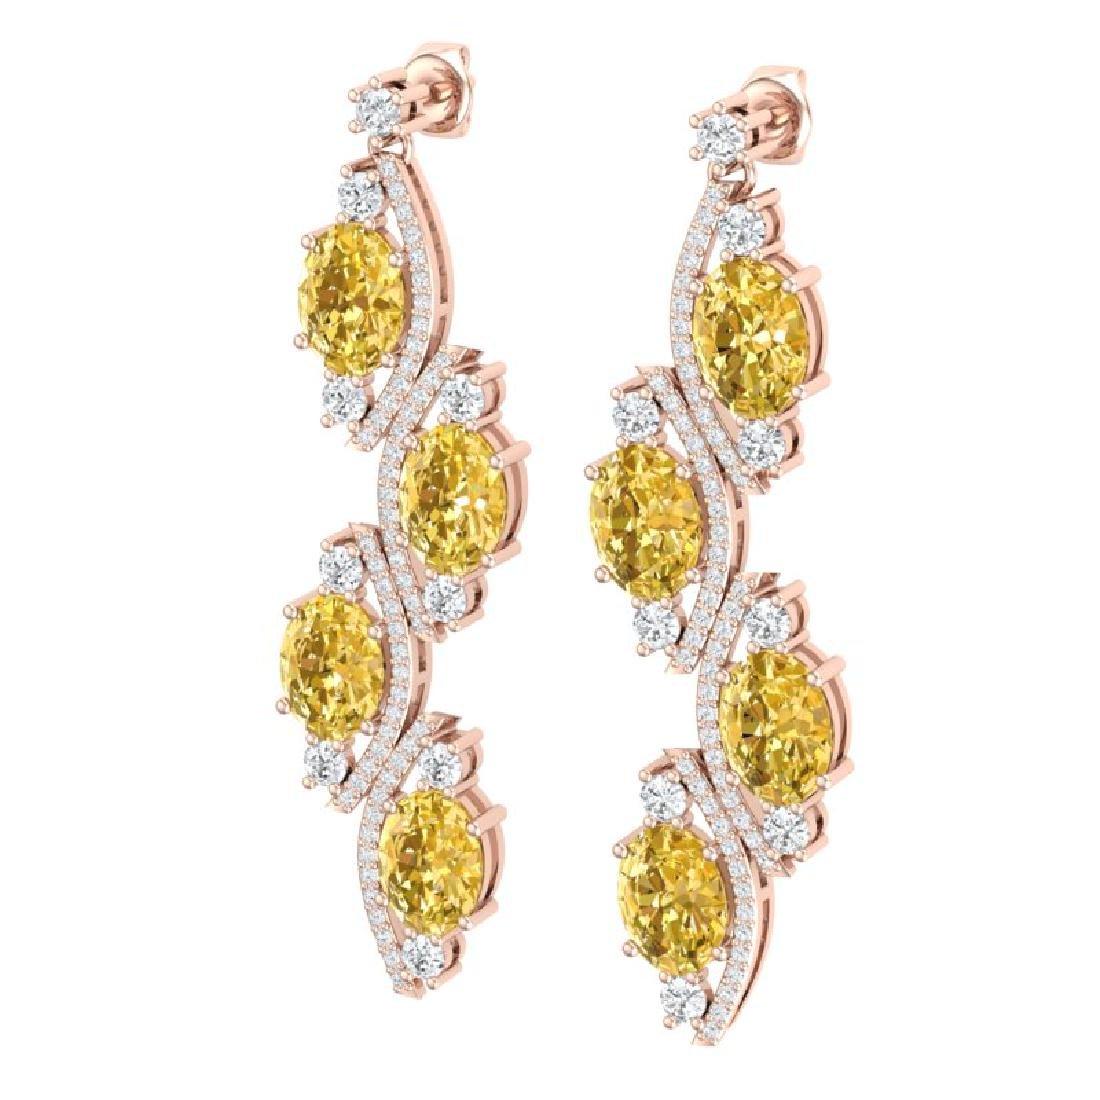 13.32 CTW Royalty Canary Citrine & VS Diamond Earrings - 2